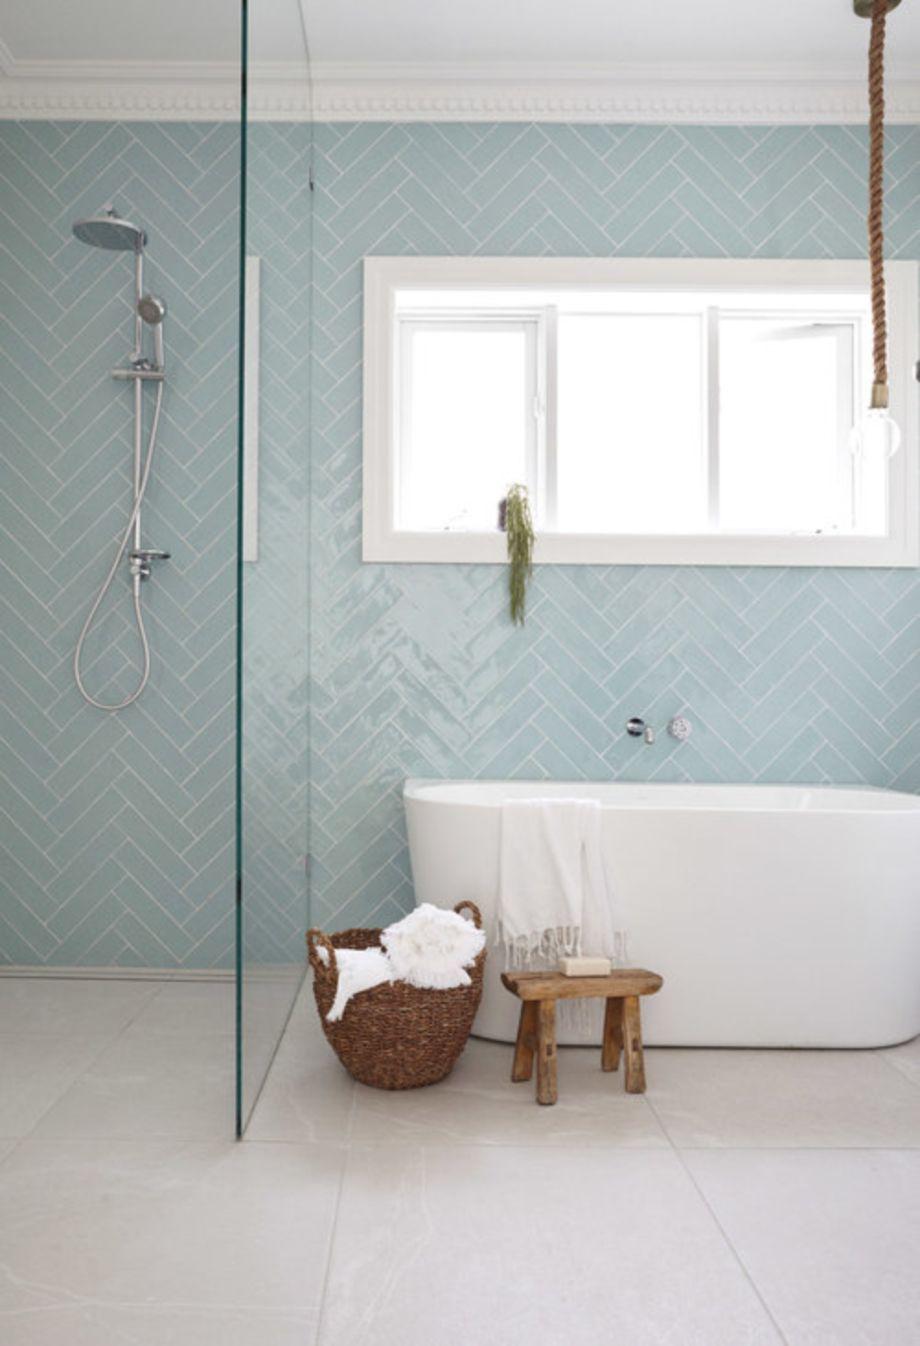 Modern small bathroom tile ideas 082 in 2018 | home | Pinterest ...